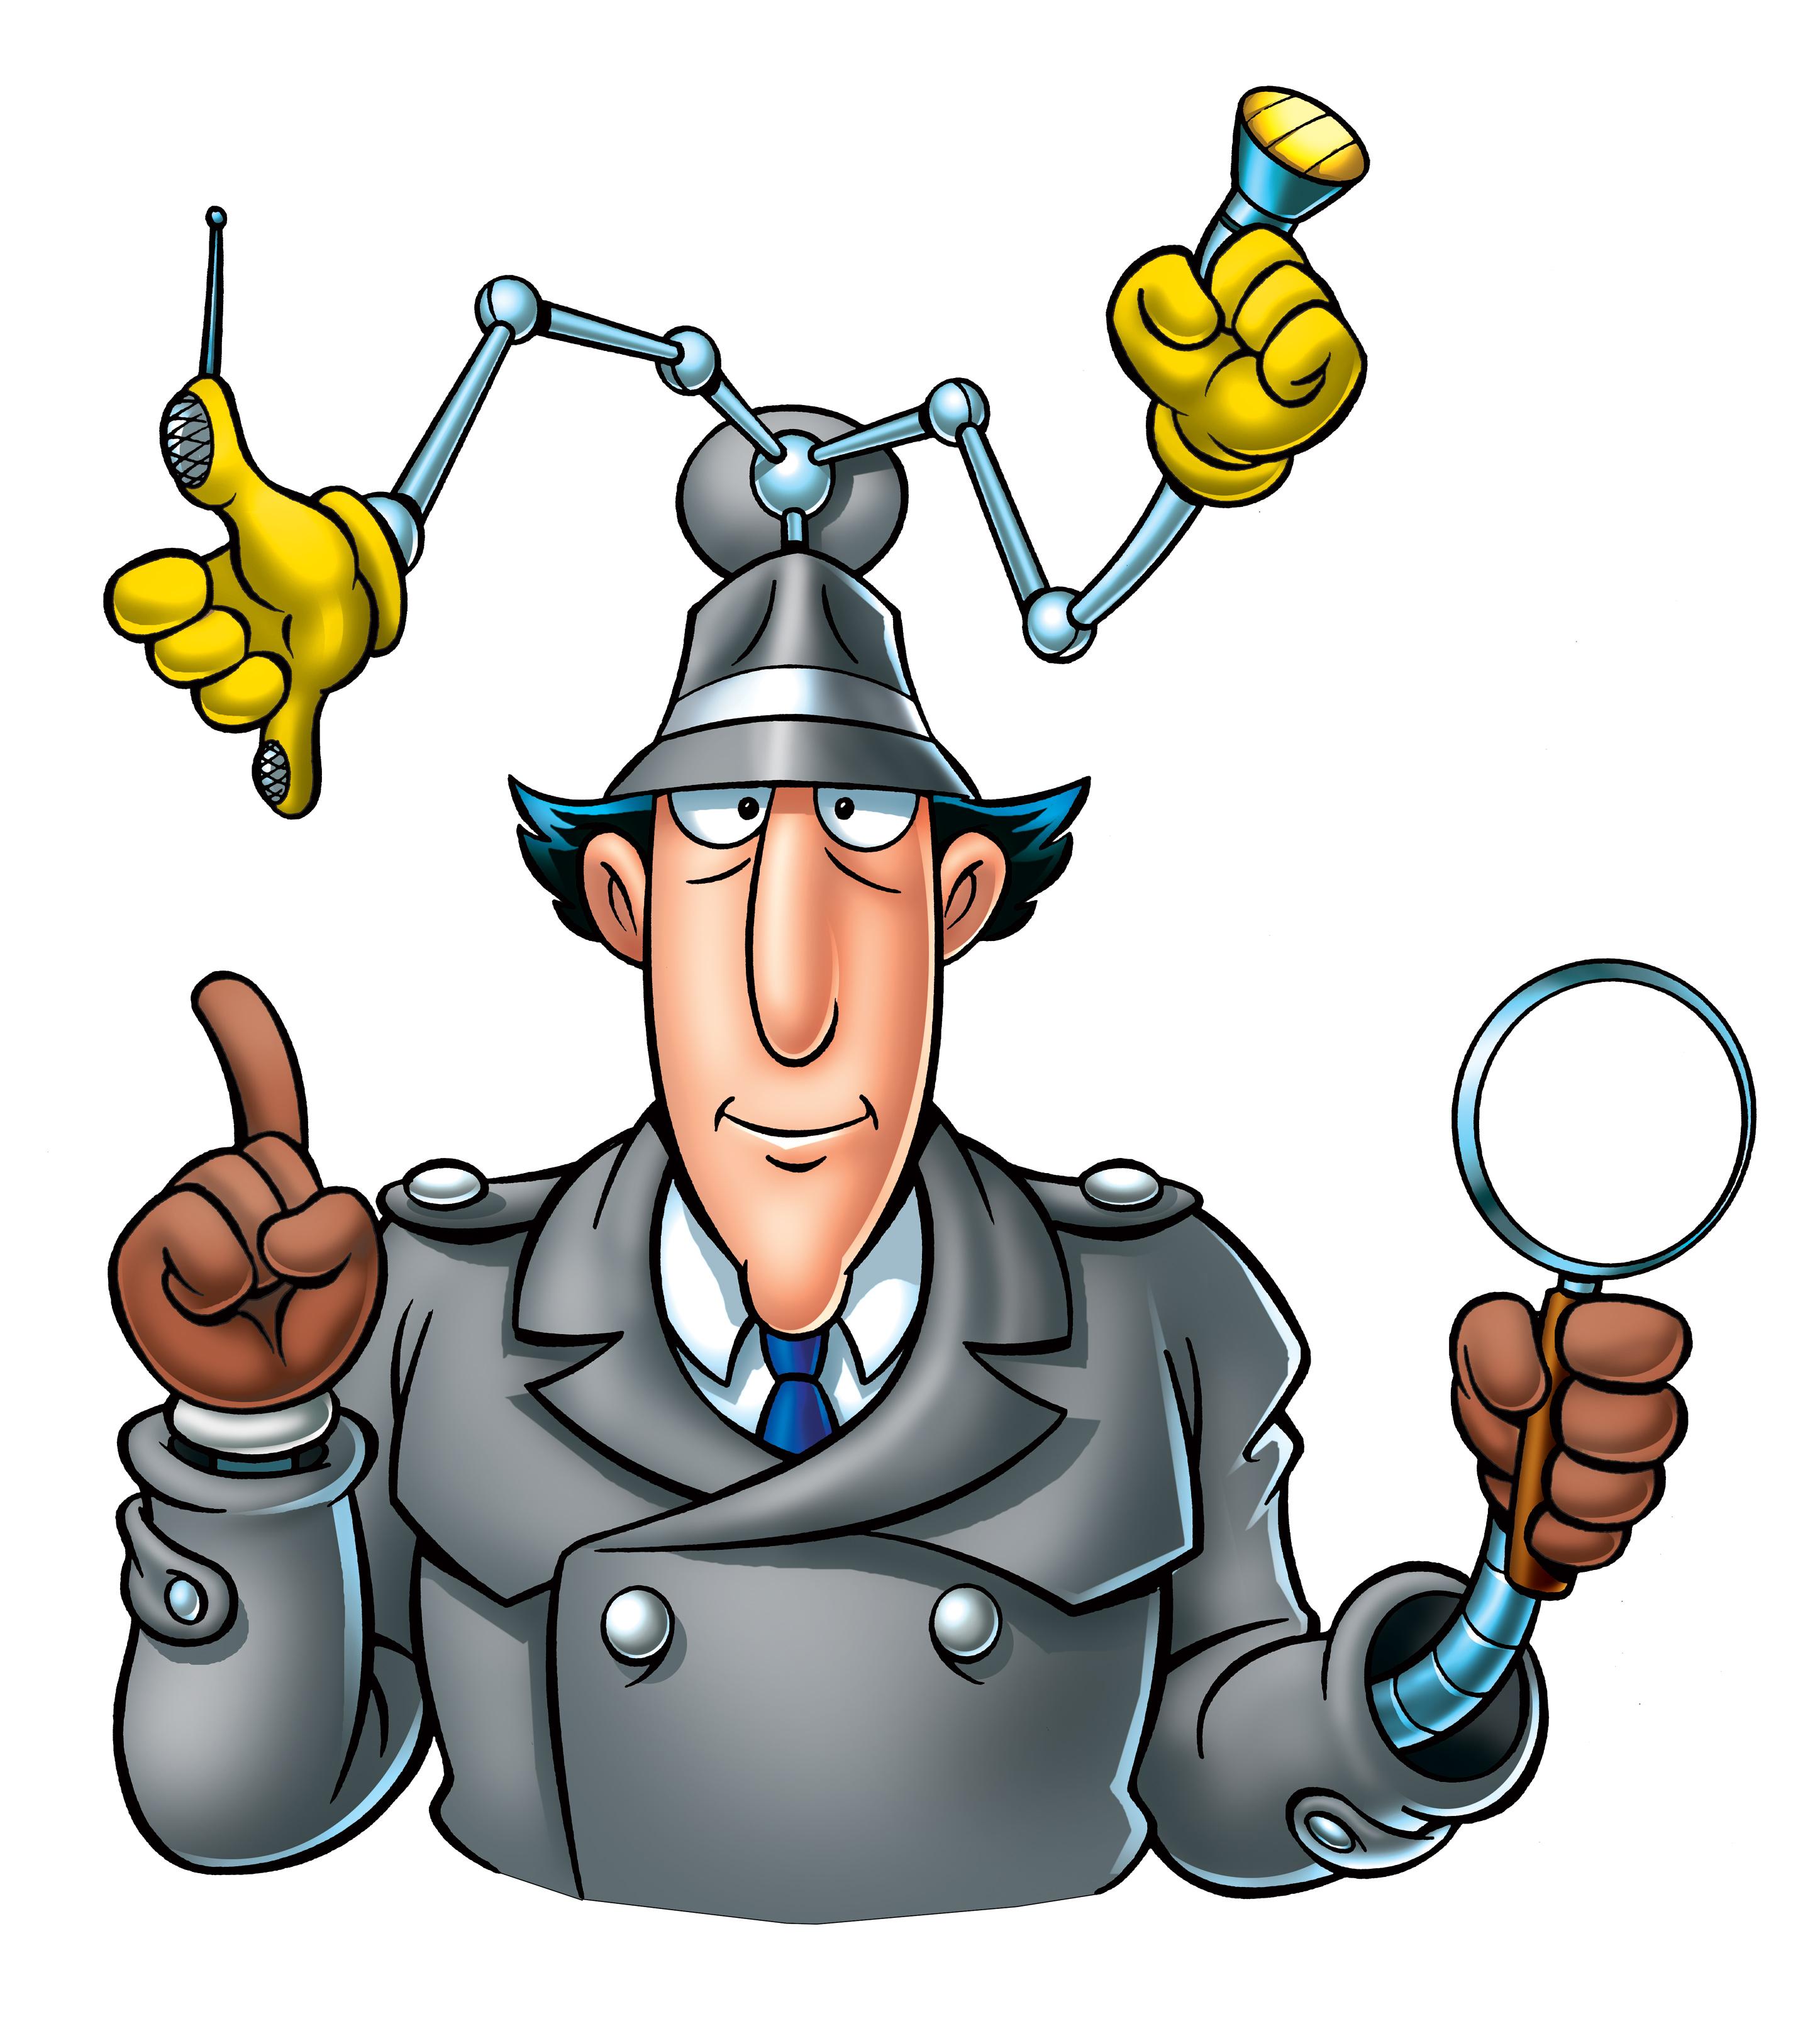 retro2011-inspector gadget